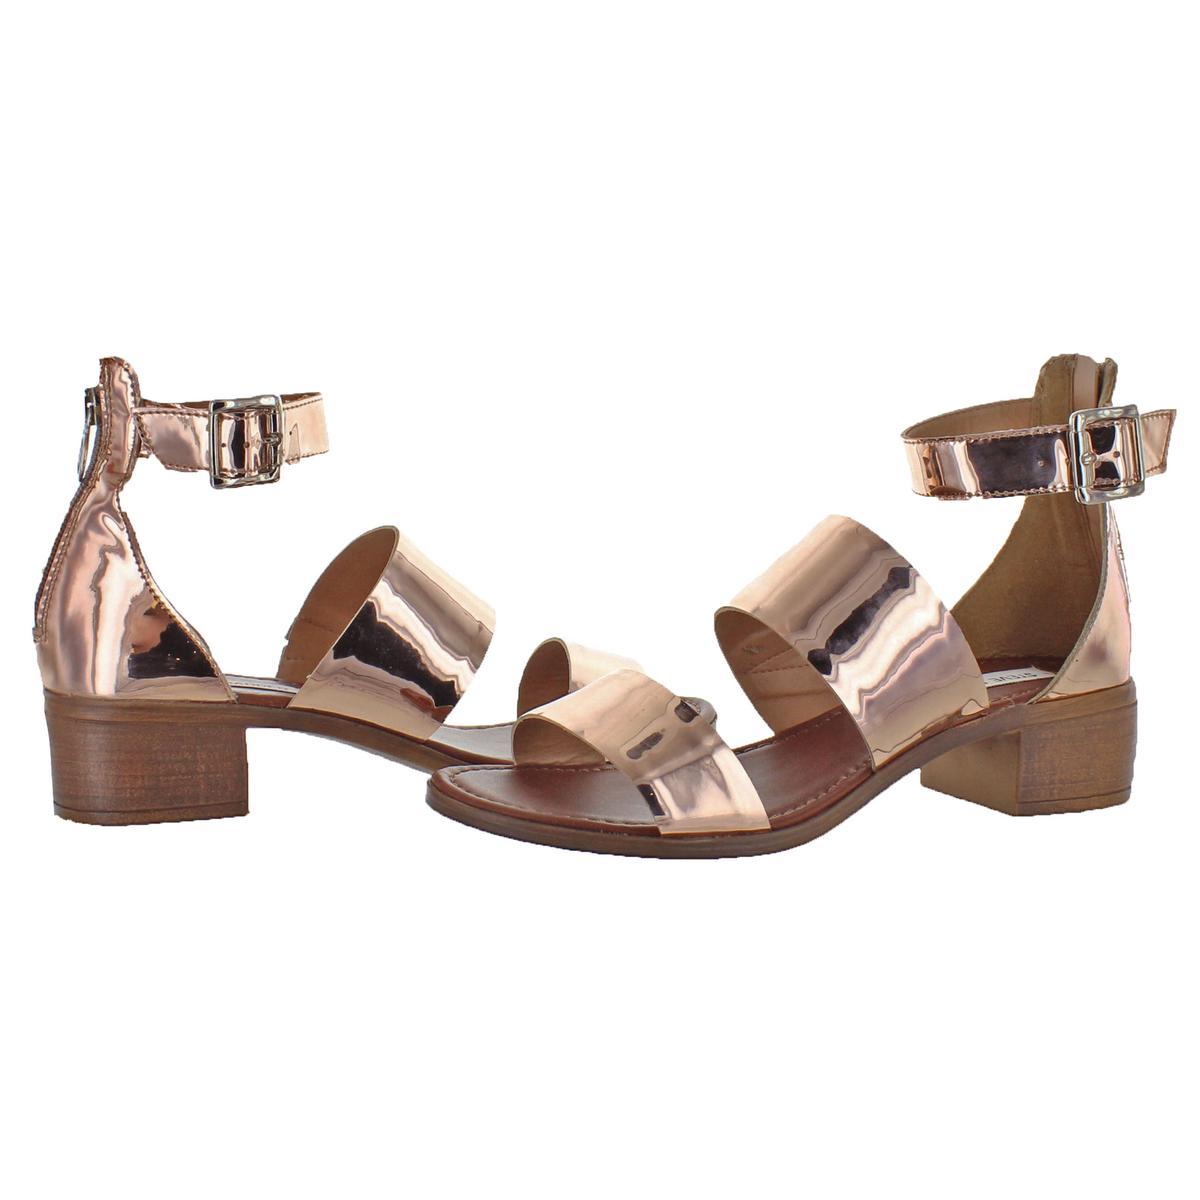 Steve-Madden-Womens-Daly-Leather-Open-Toe-Dress-Heels-Sandals-BHFO-5458 thumbnail 8